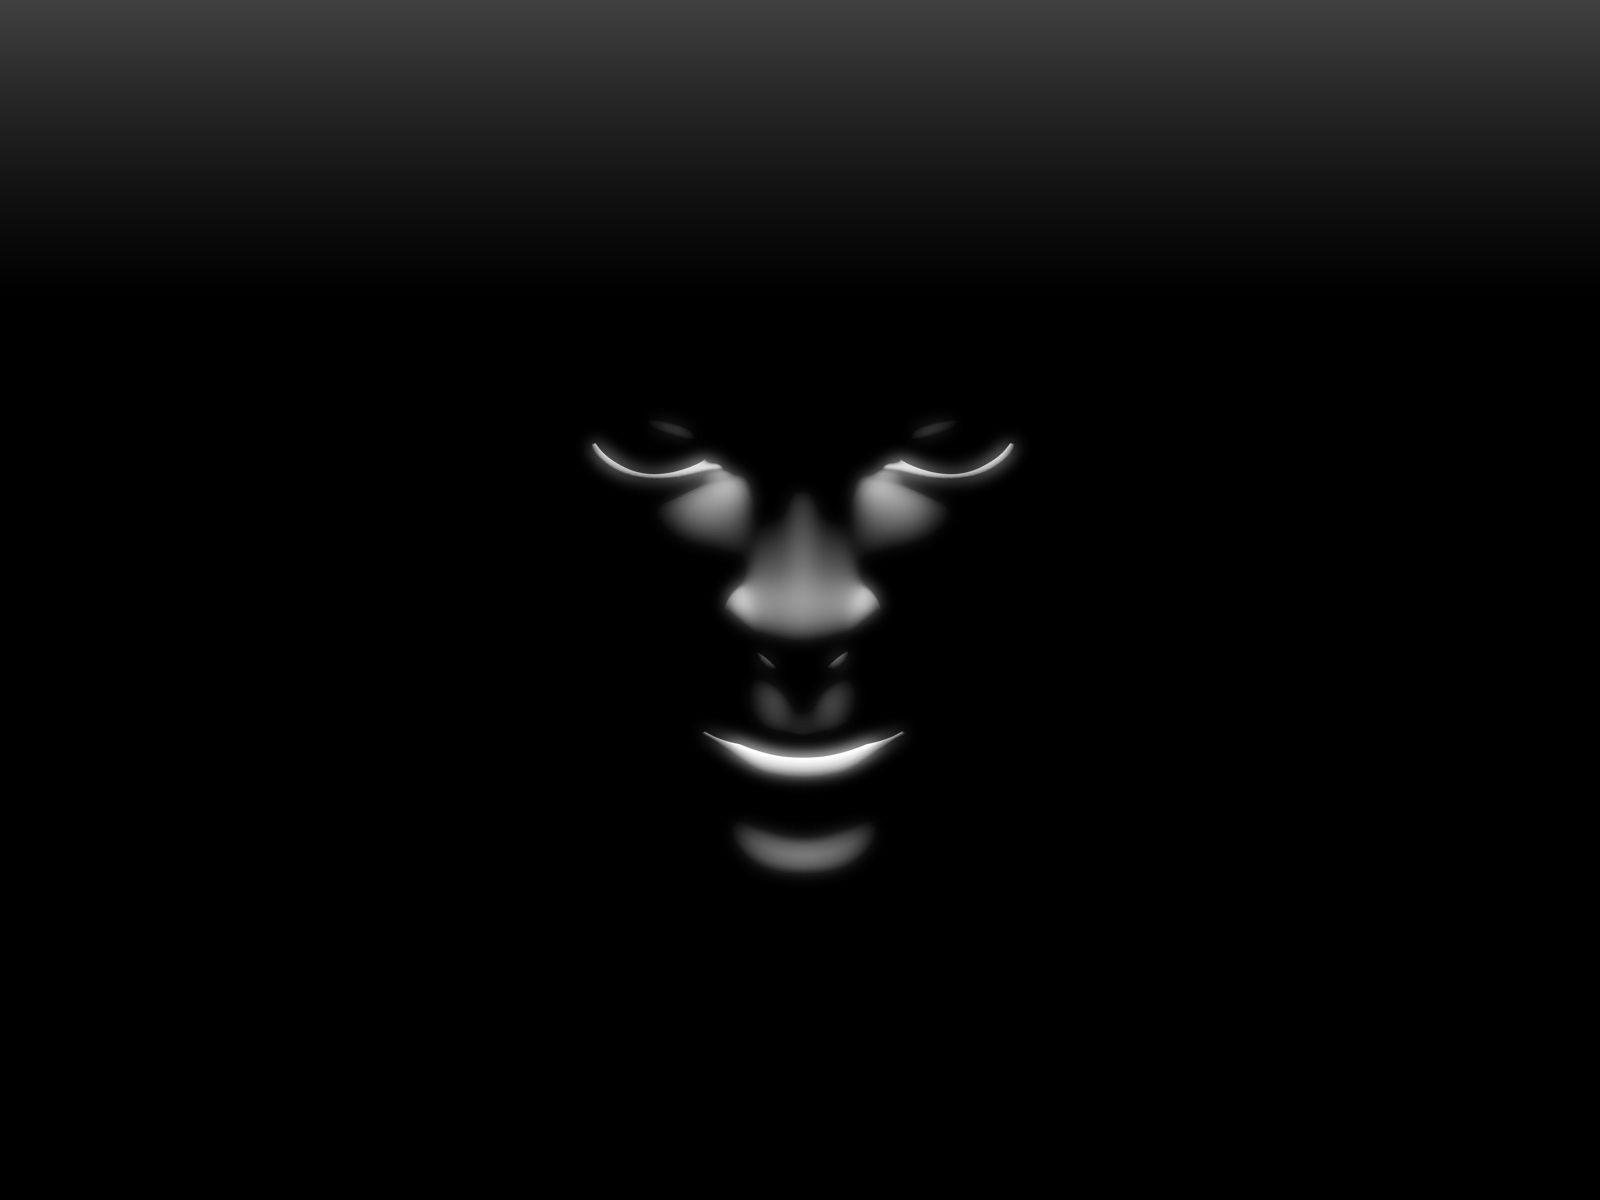 Black Wallpaper Black Shadow Face Pure Black Wallpaper Black And White Abstract Black Wallpaper